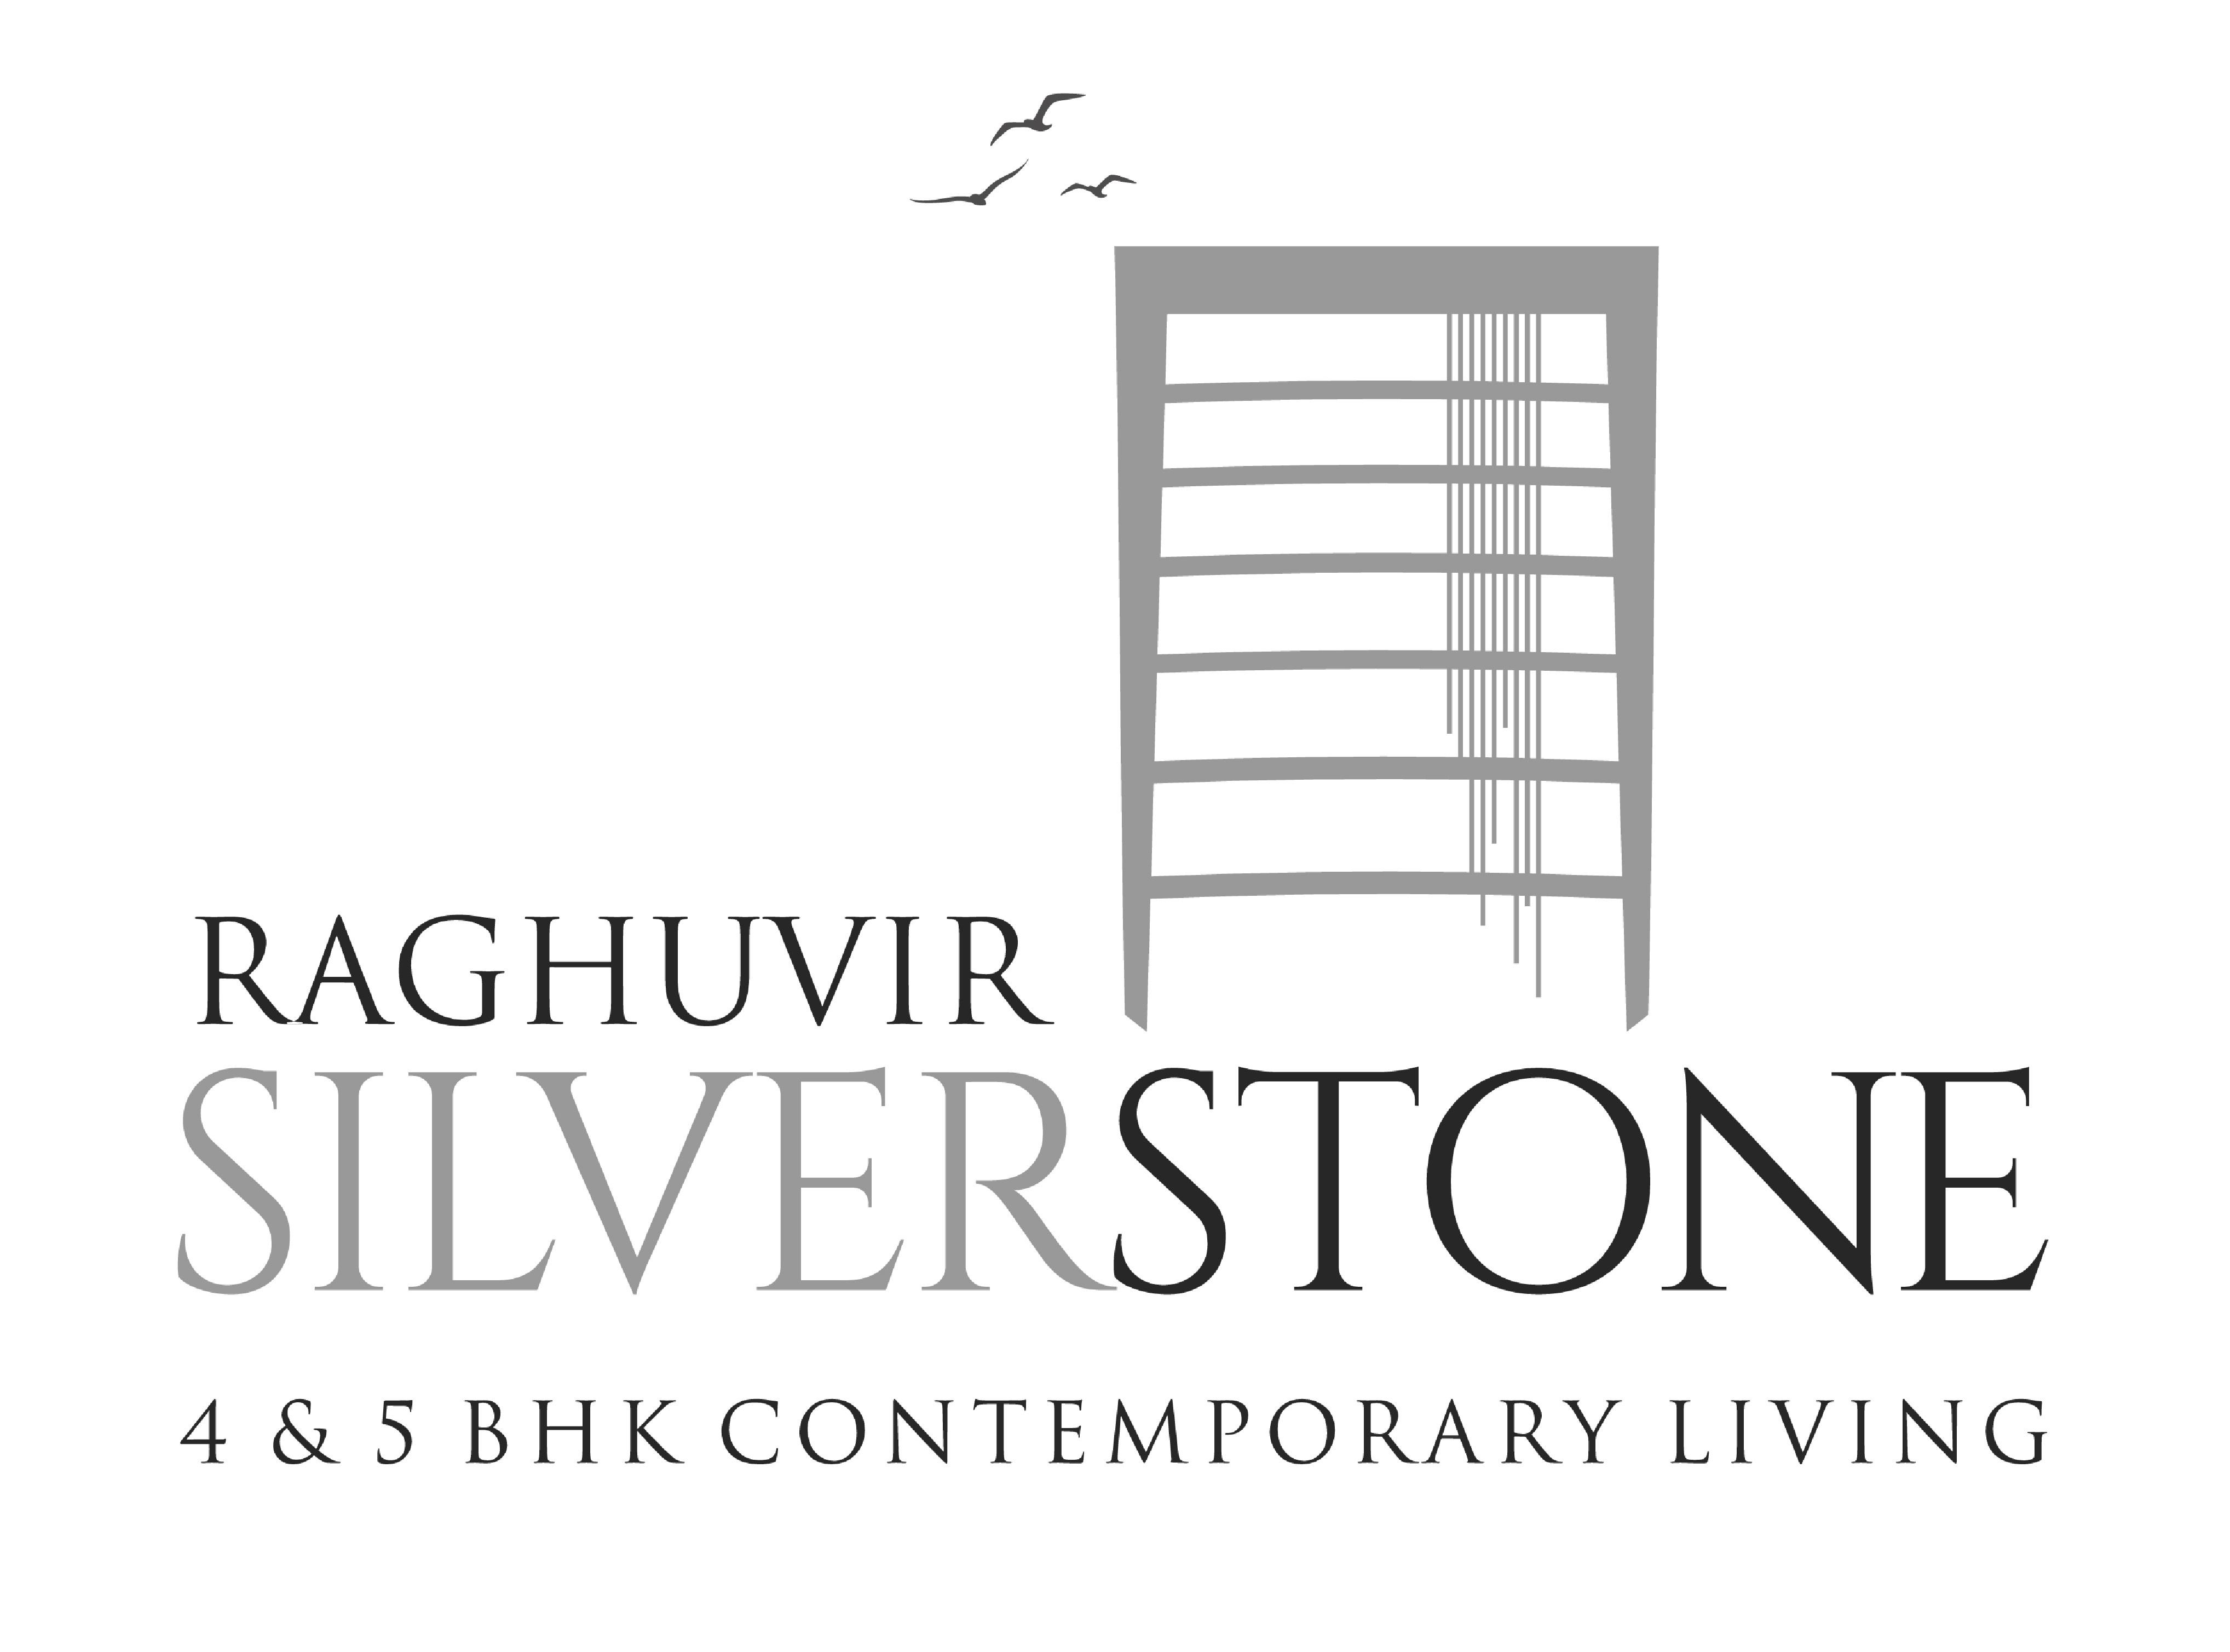 LOGO - Raghuvir Silverstone